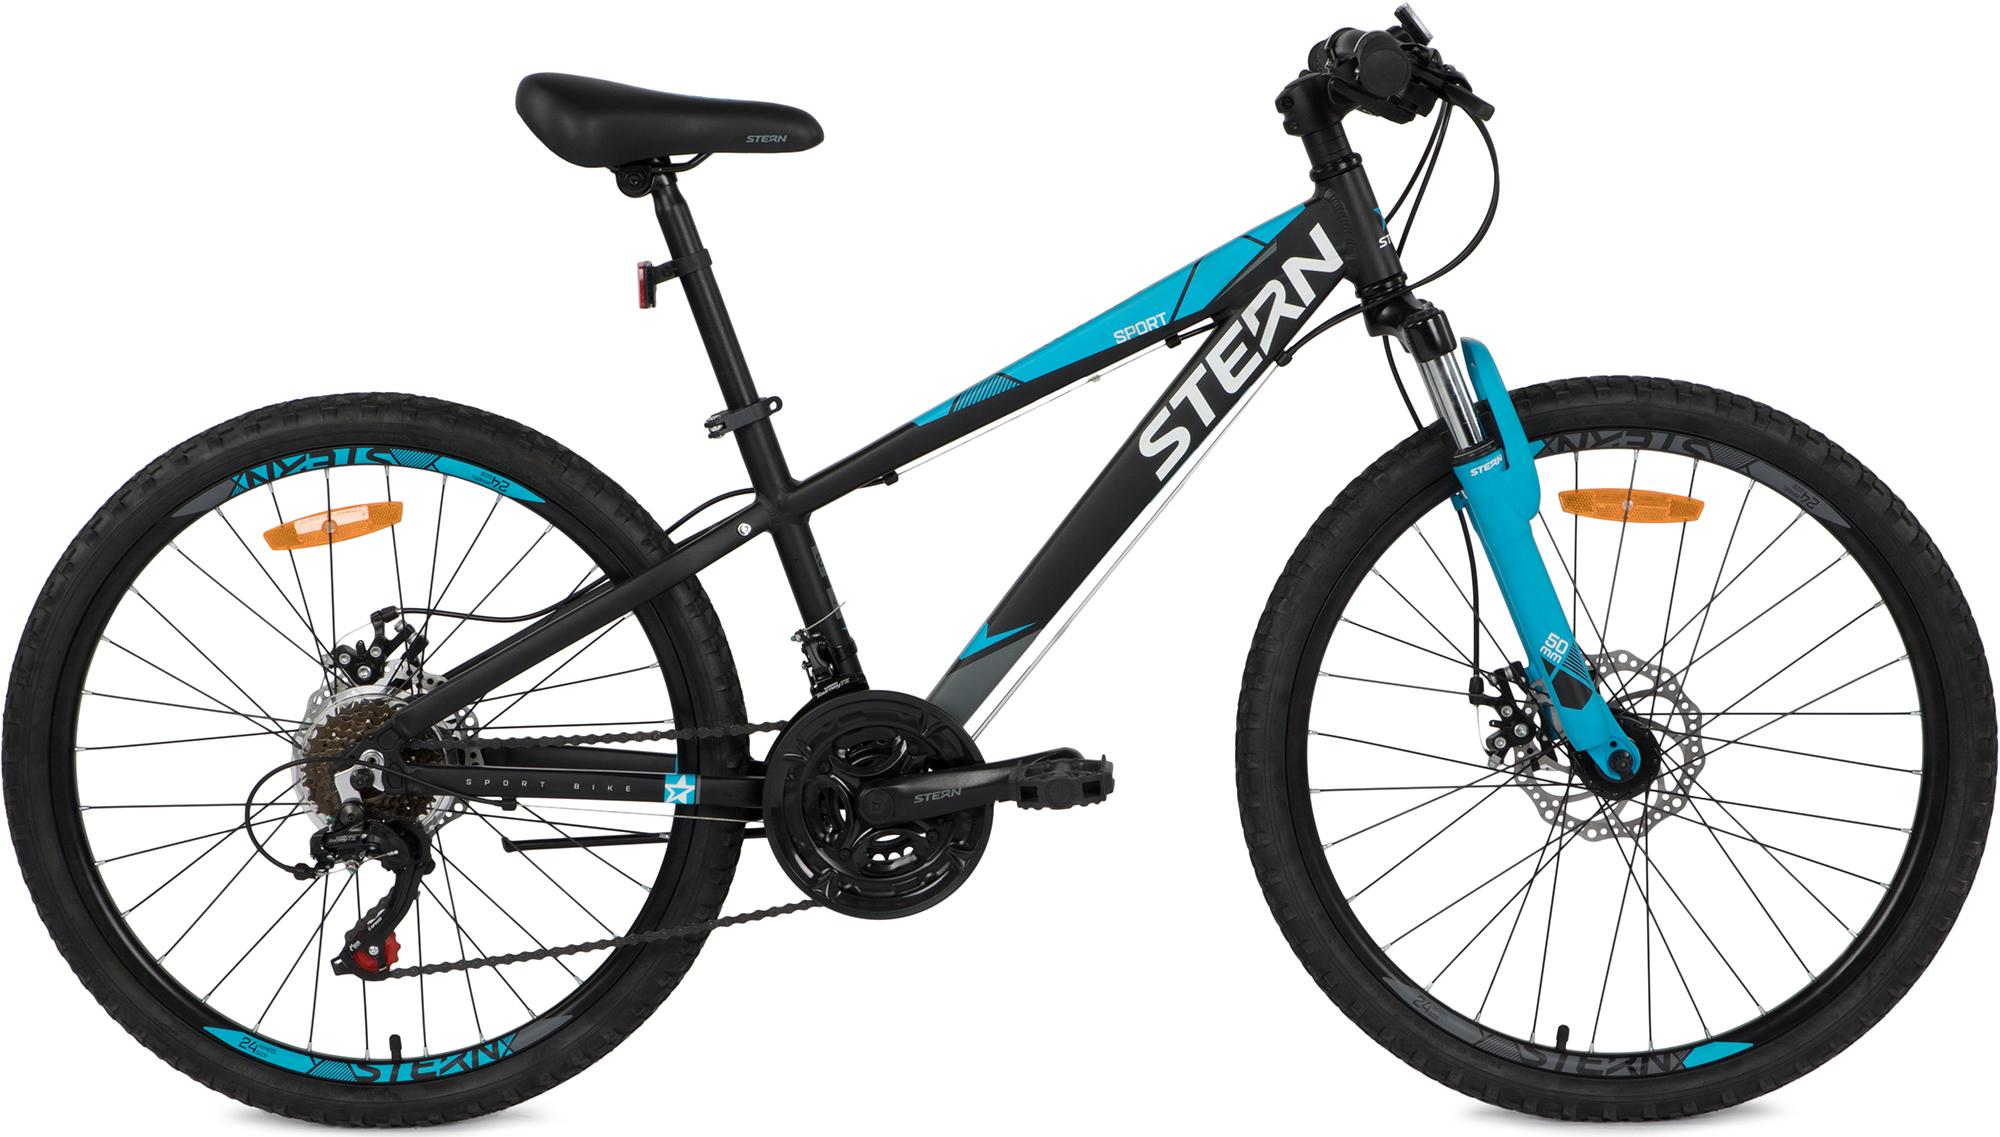 Stern Велосипед подростковый Stern Attack 24 Sport alt цена